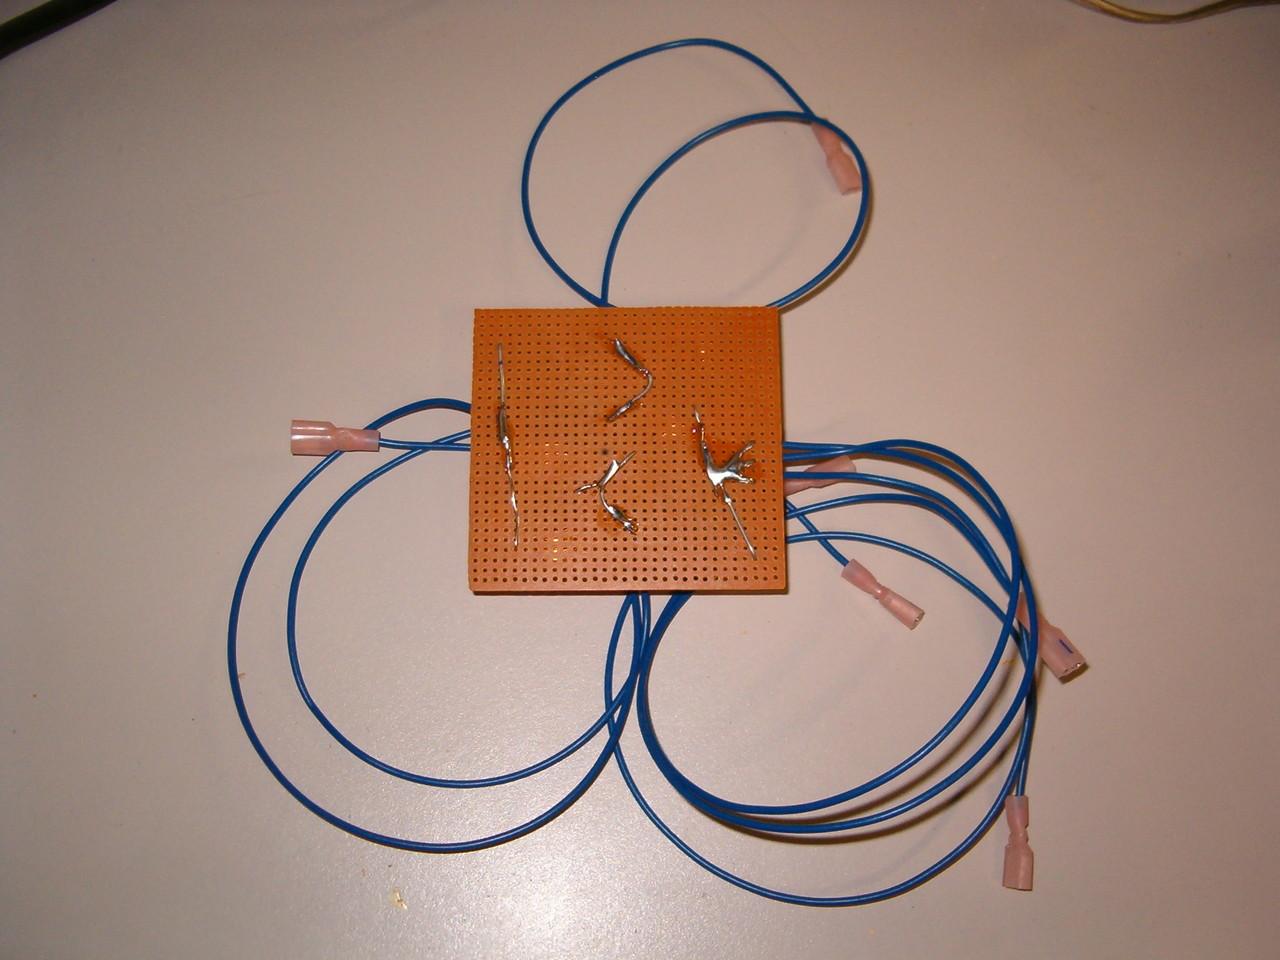 Nick Viera 2 Way Bookshelf Speakers With Speaker Crossover Wiring Diagram Custom Set Photo Large Xl